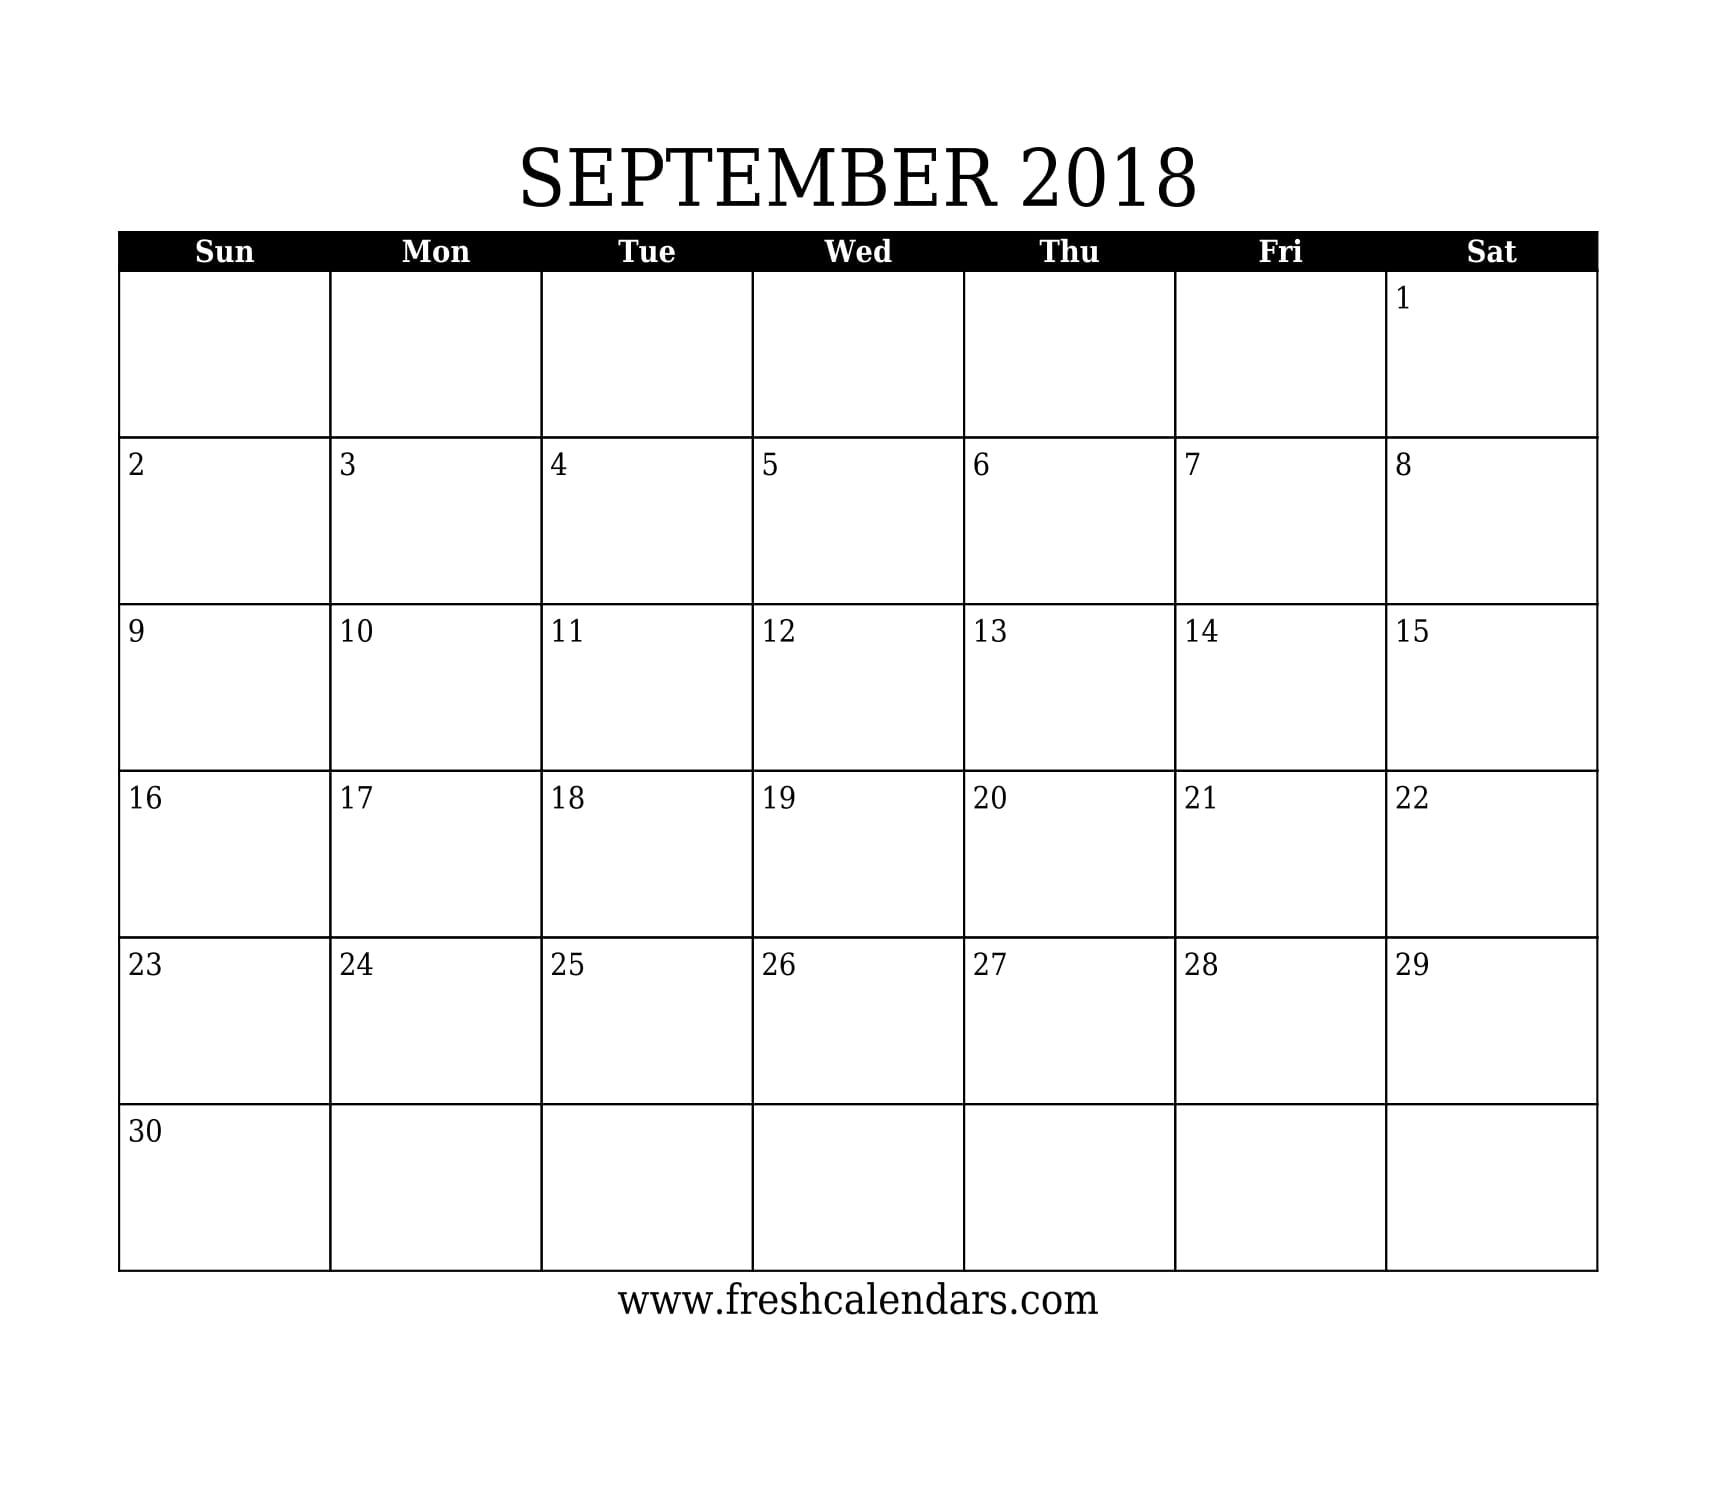 September 2018 Calendar Printable - Fresh Calendars intended for September Calendar Printable Template